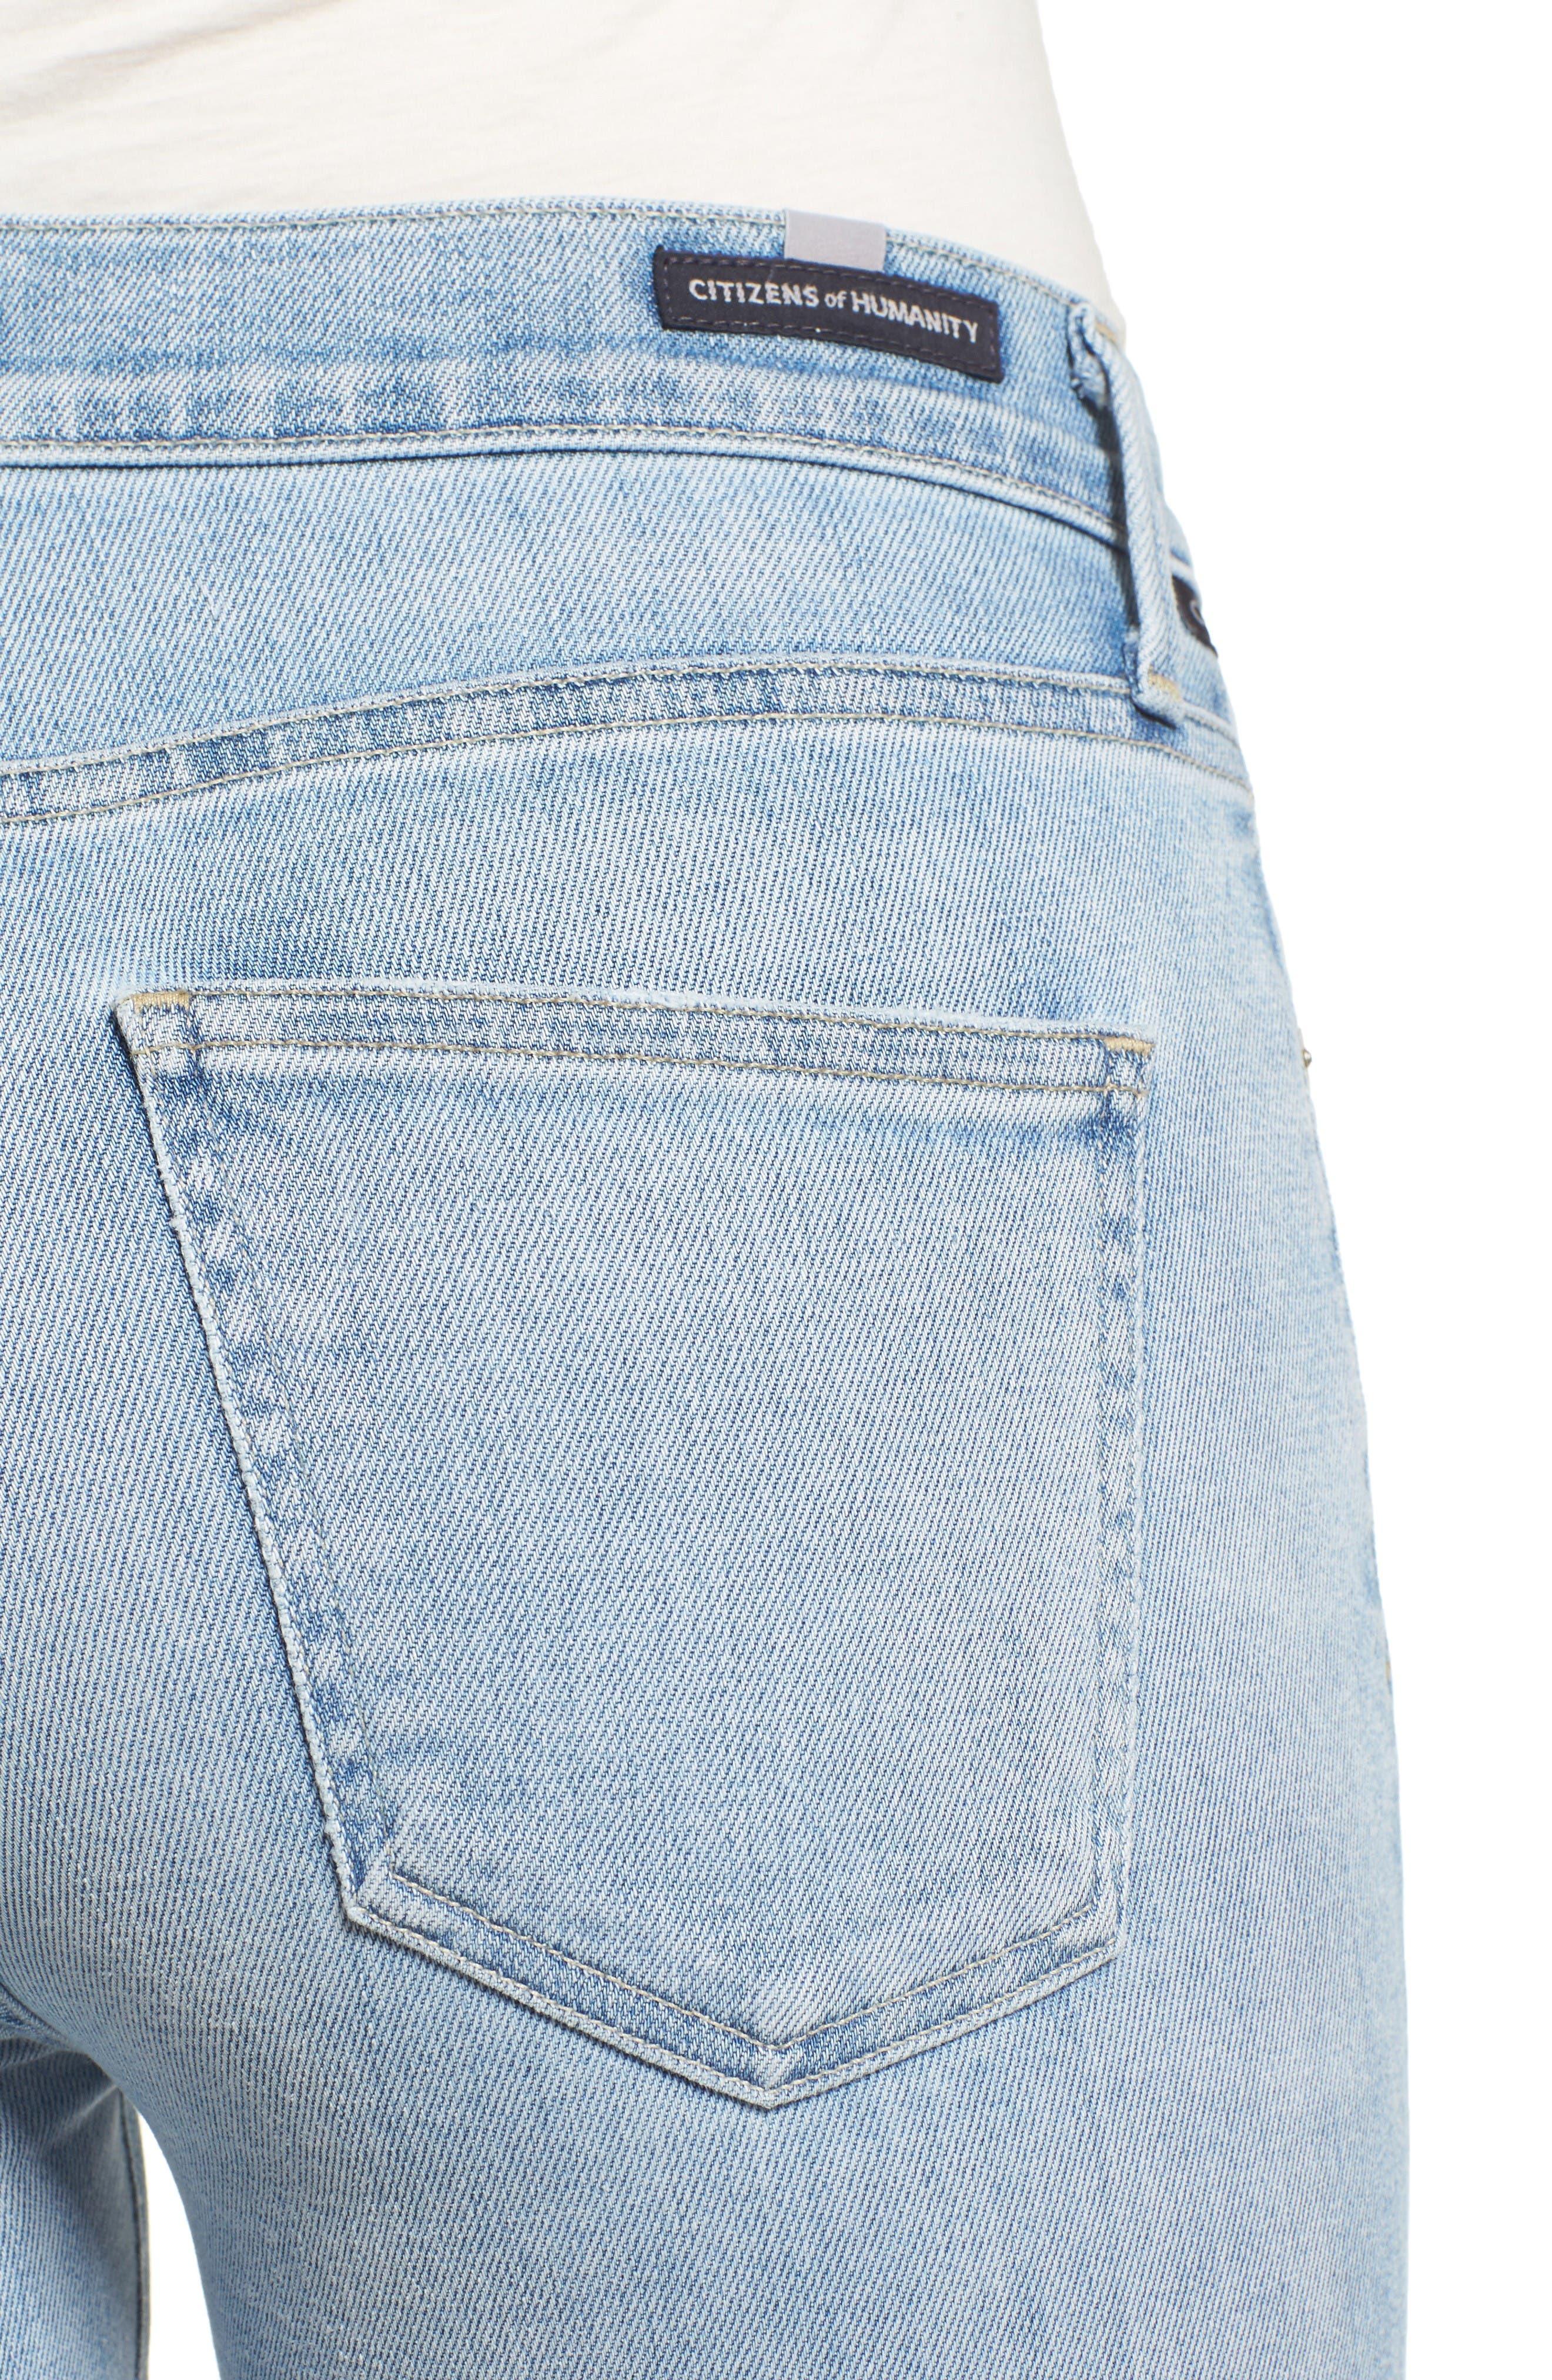 Rocket High Waist Crop Skinny Jeans,                             Alternate thumbnail 4, color,                             Oracle Blue